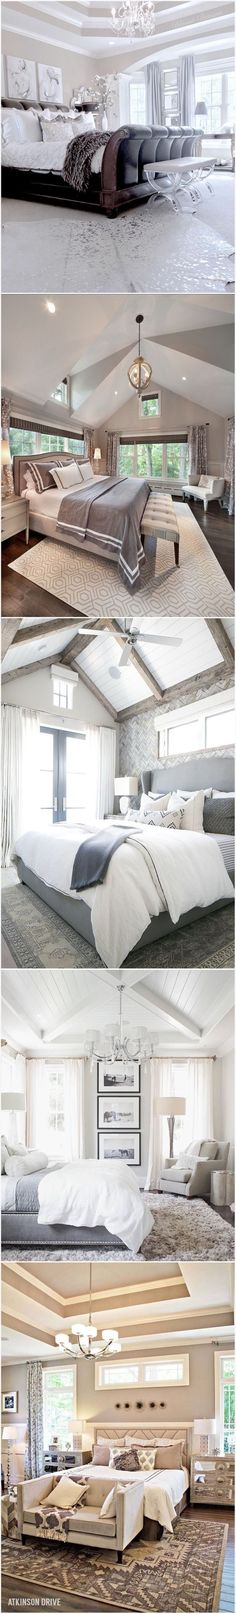 Gorgeous Modern Bedroom Design Ideas